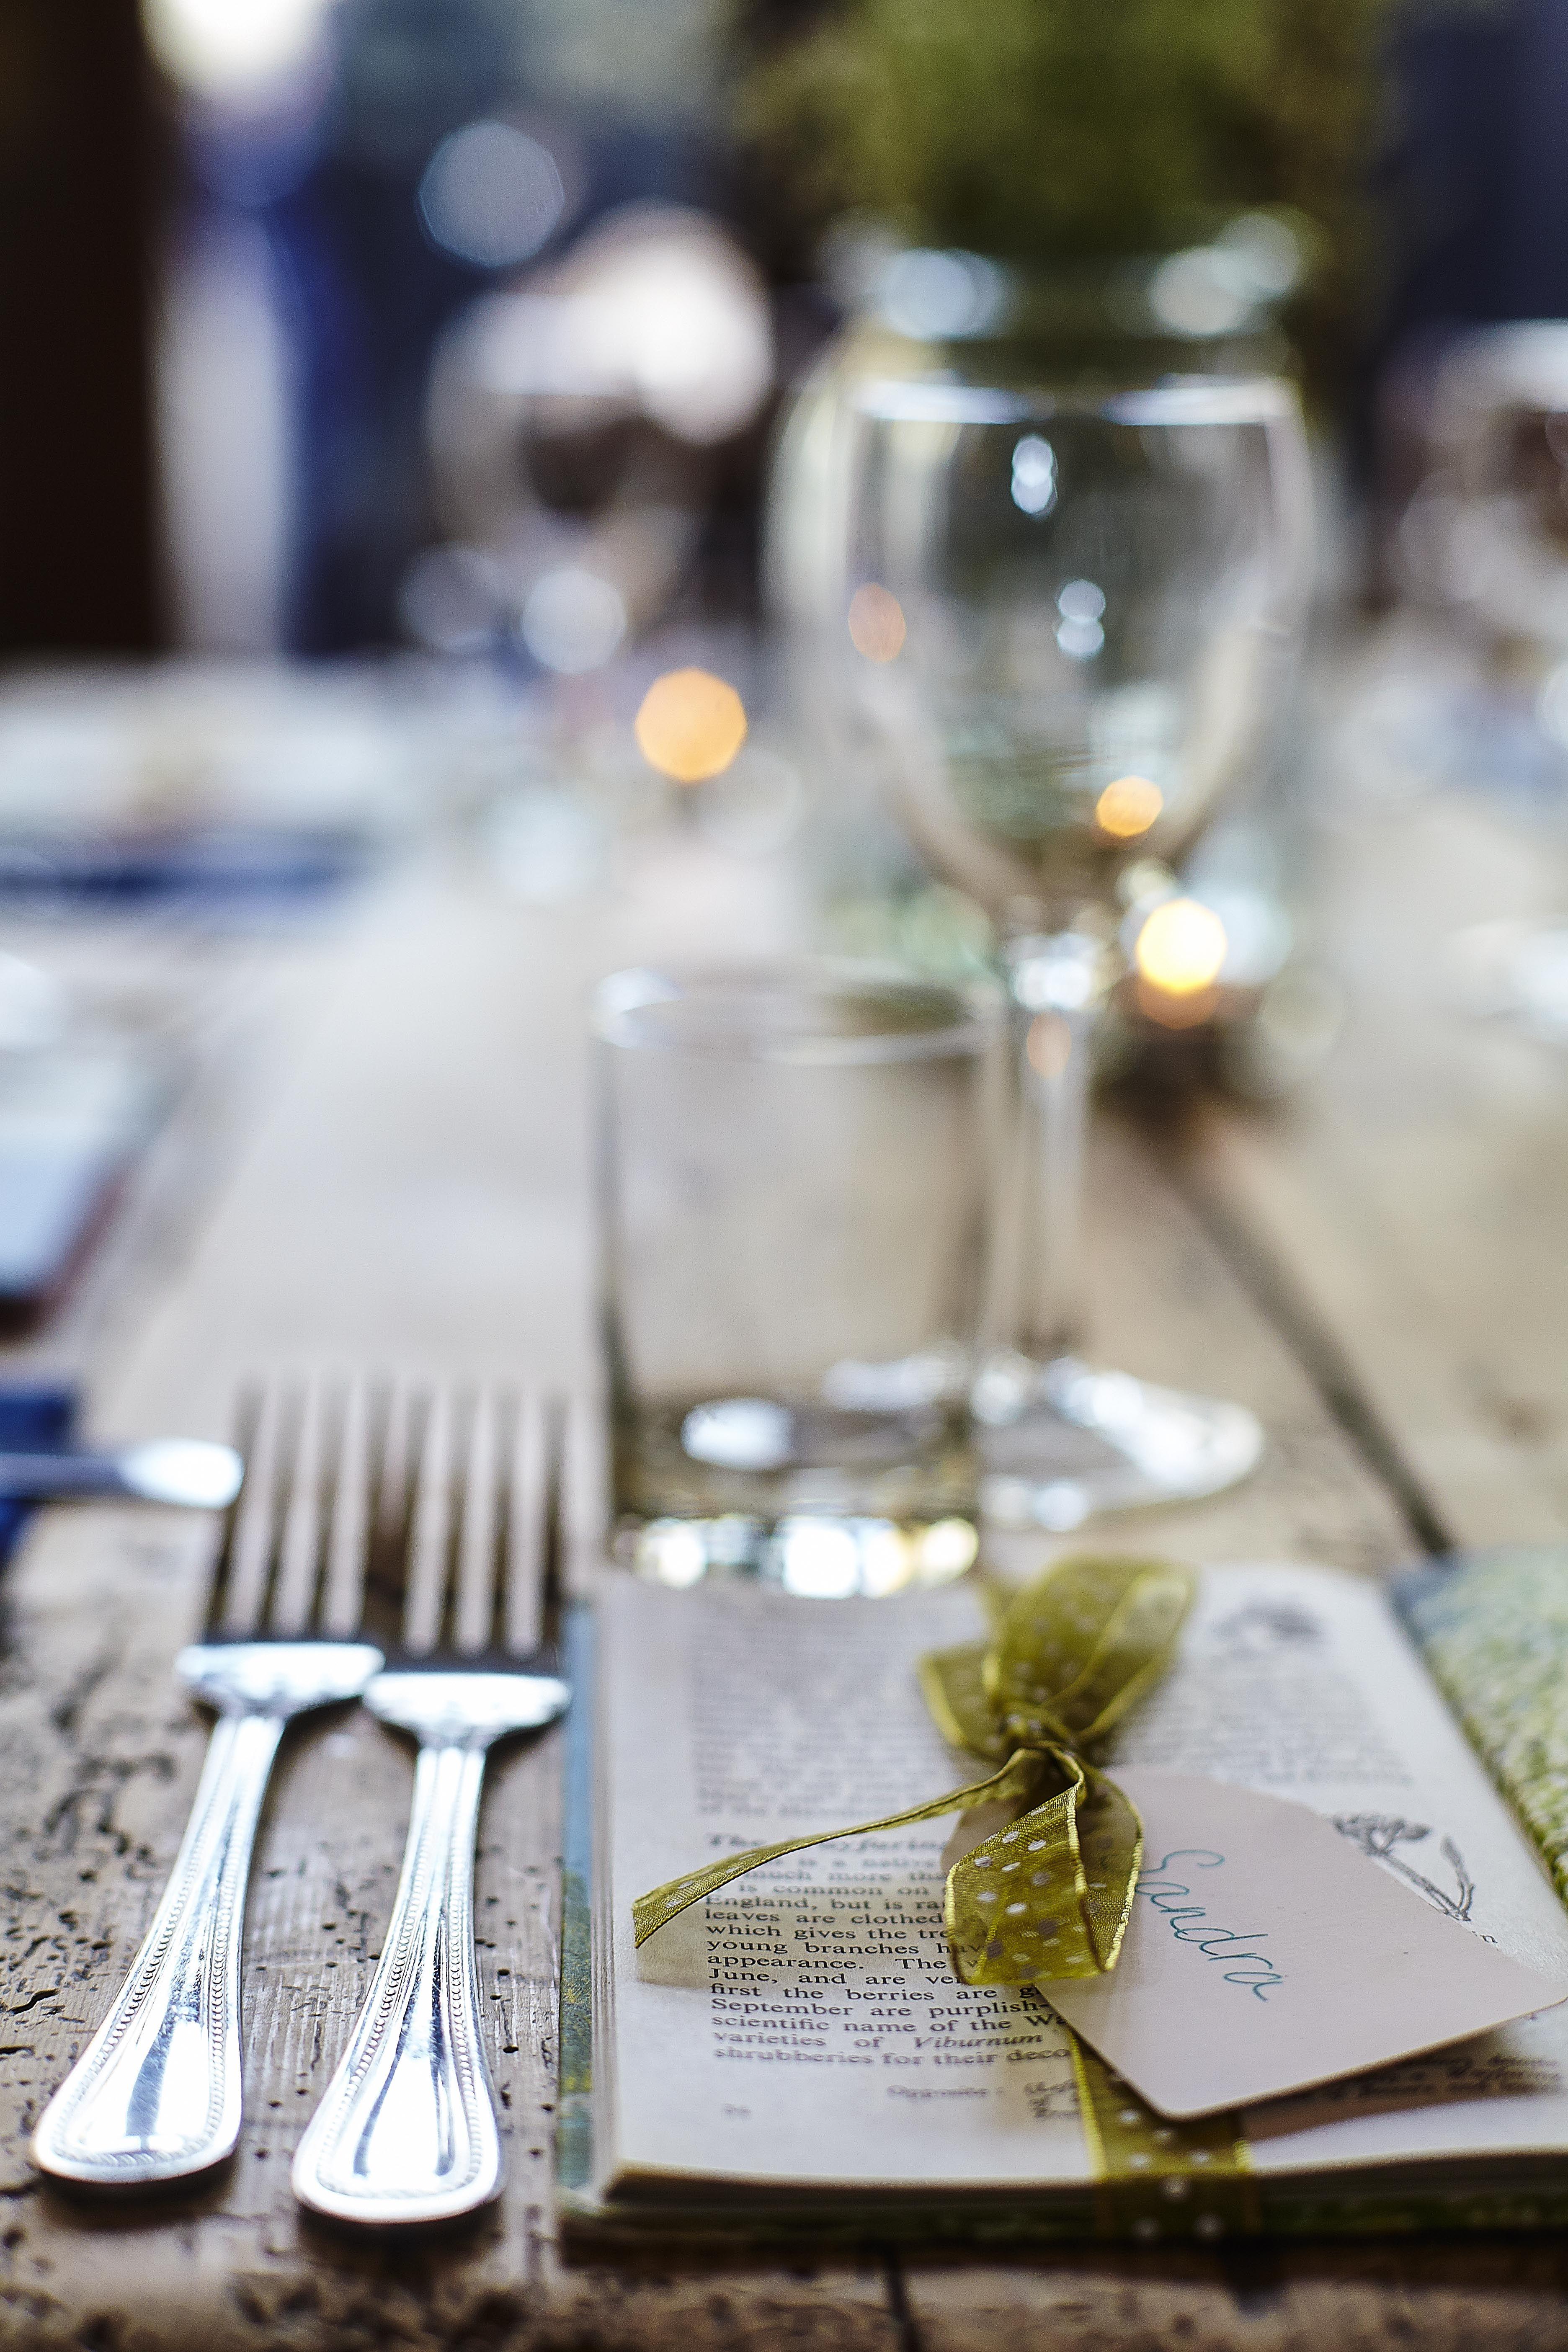 Restaurant table setting ideas - Restaurant Table Setting Ideas 40